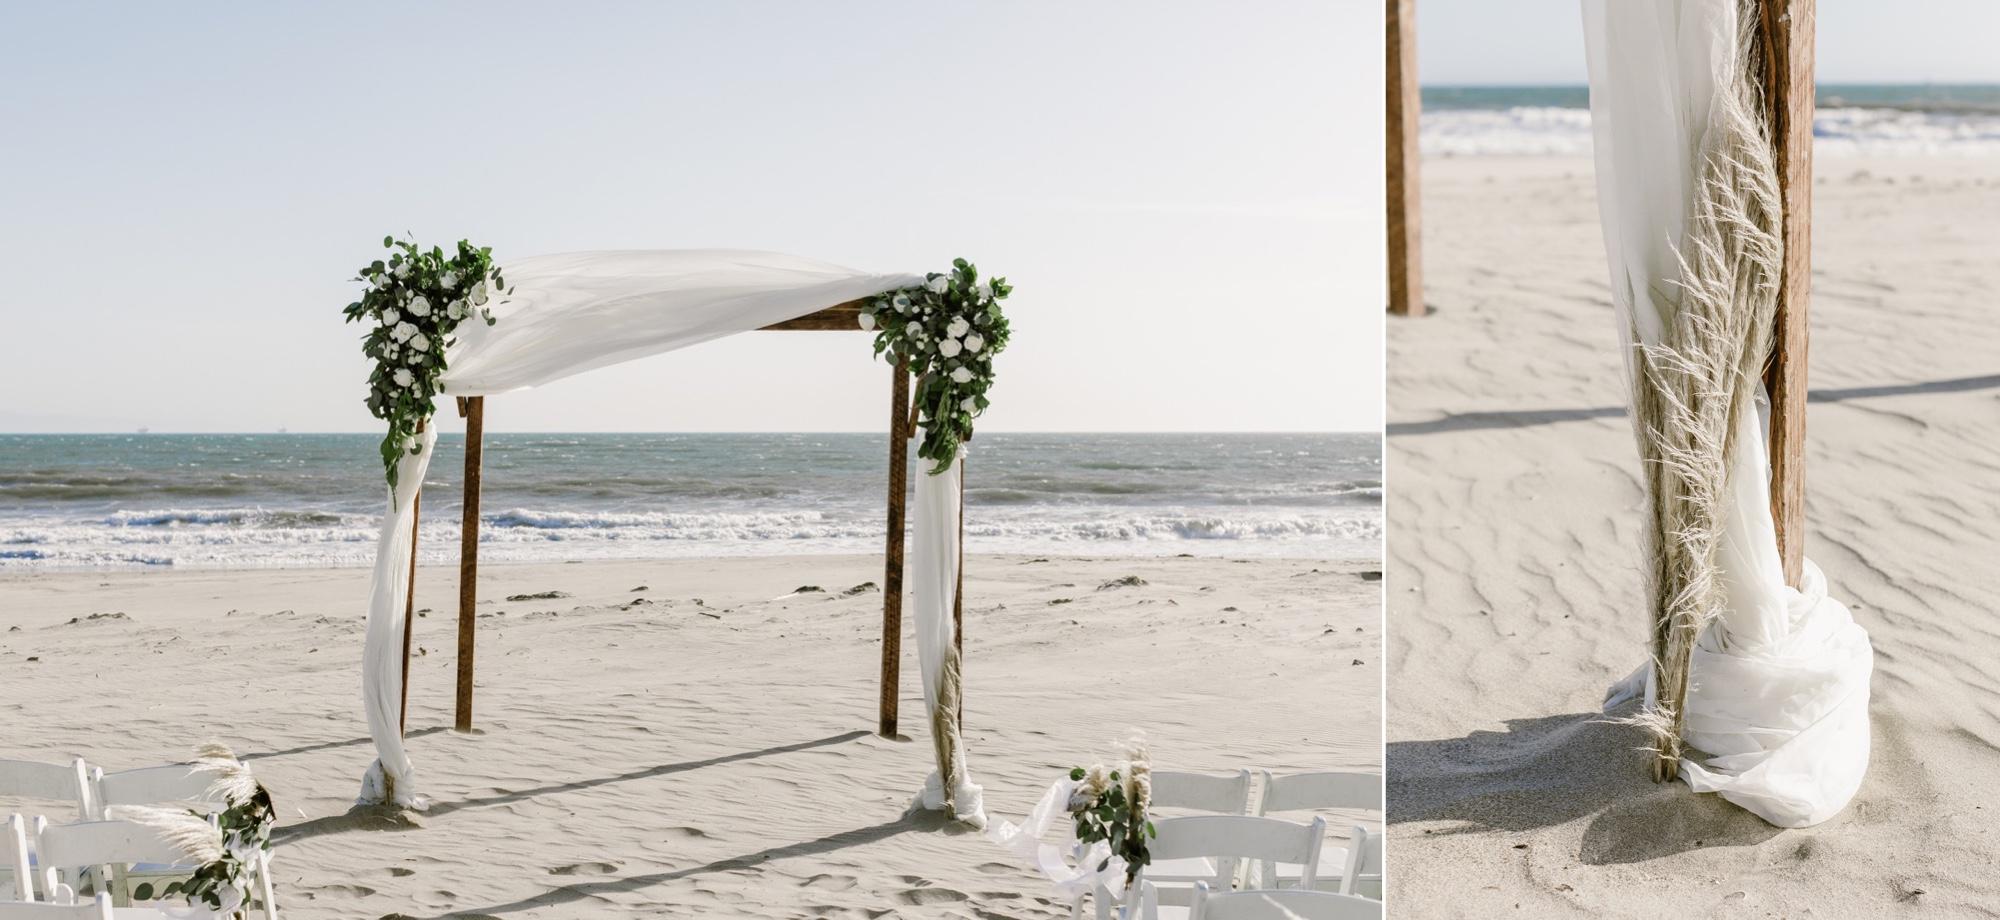 26_Ally and Tommy's Wedding-472_Ally and Tommy's Wedding-469_beach_details_wedding_ceremony.jpg